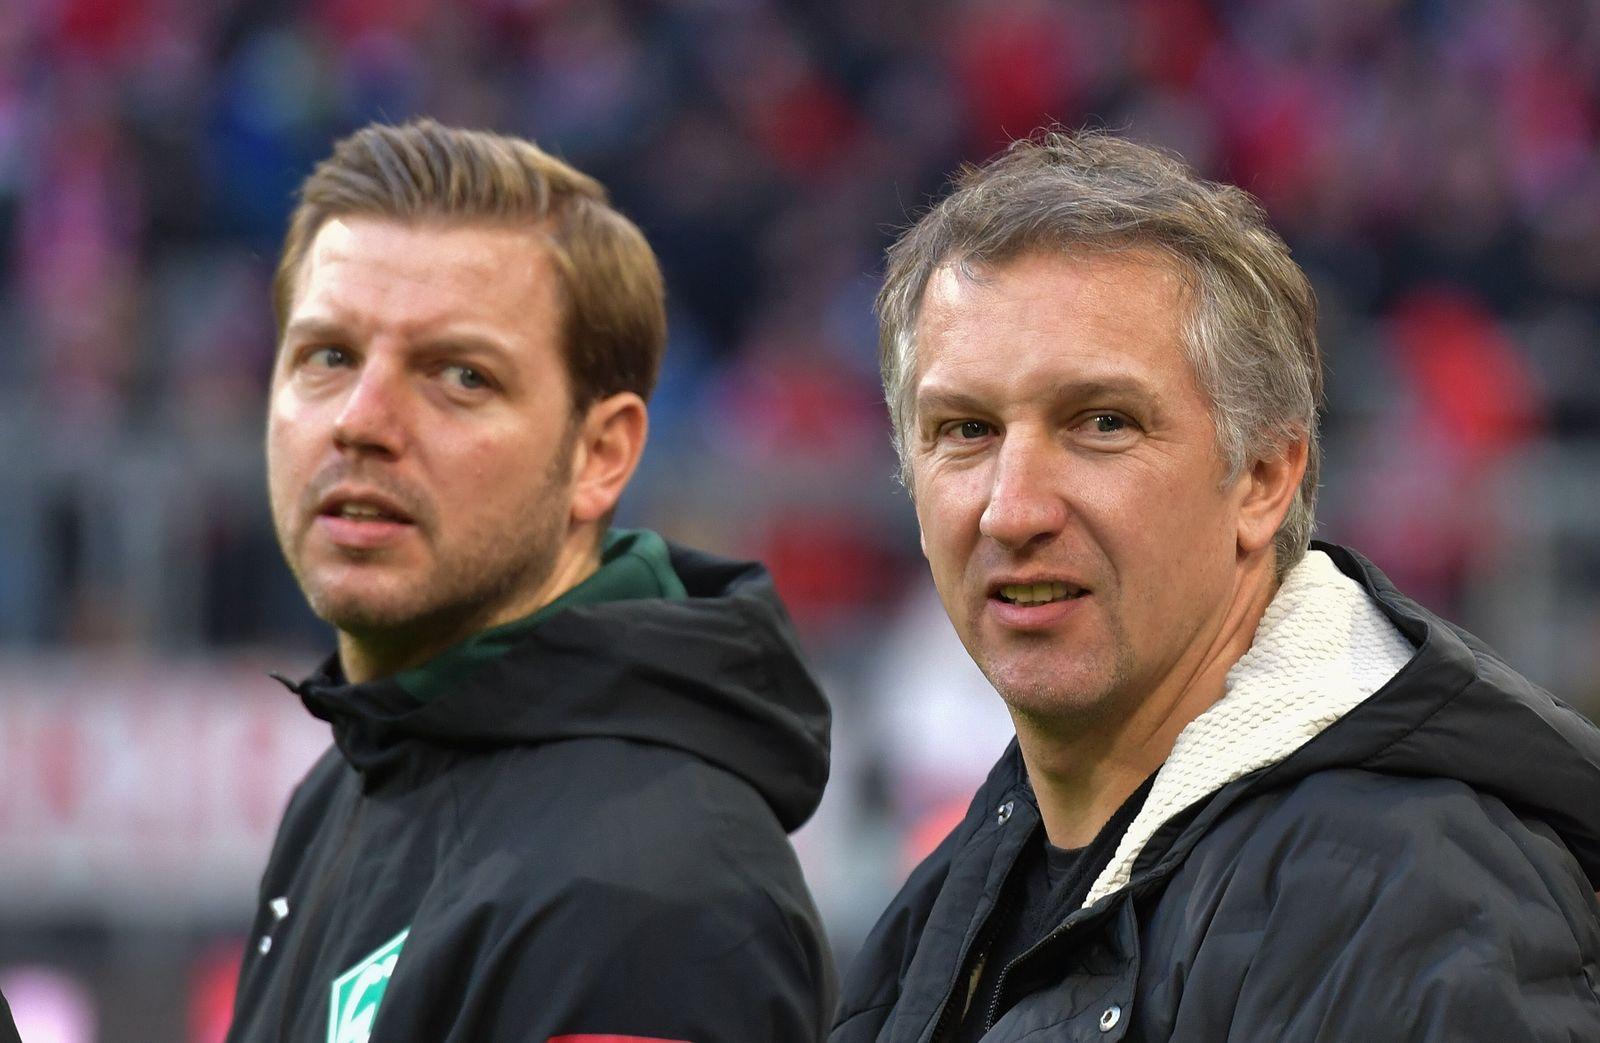 14.12.2019, xblx, Fussball 1.Bundesliga, FC Bayern Muenchen - SV Werder Bremen emspor, v.l. Trainer Florian Kohfeldt (SV